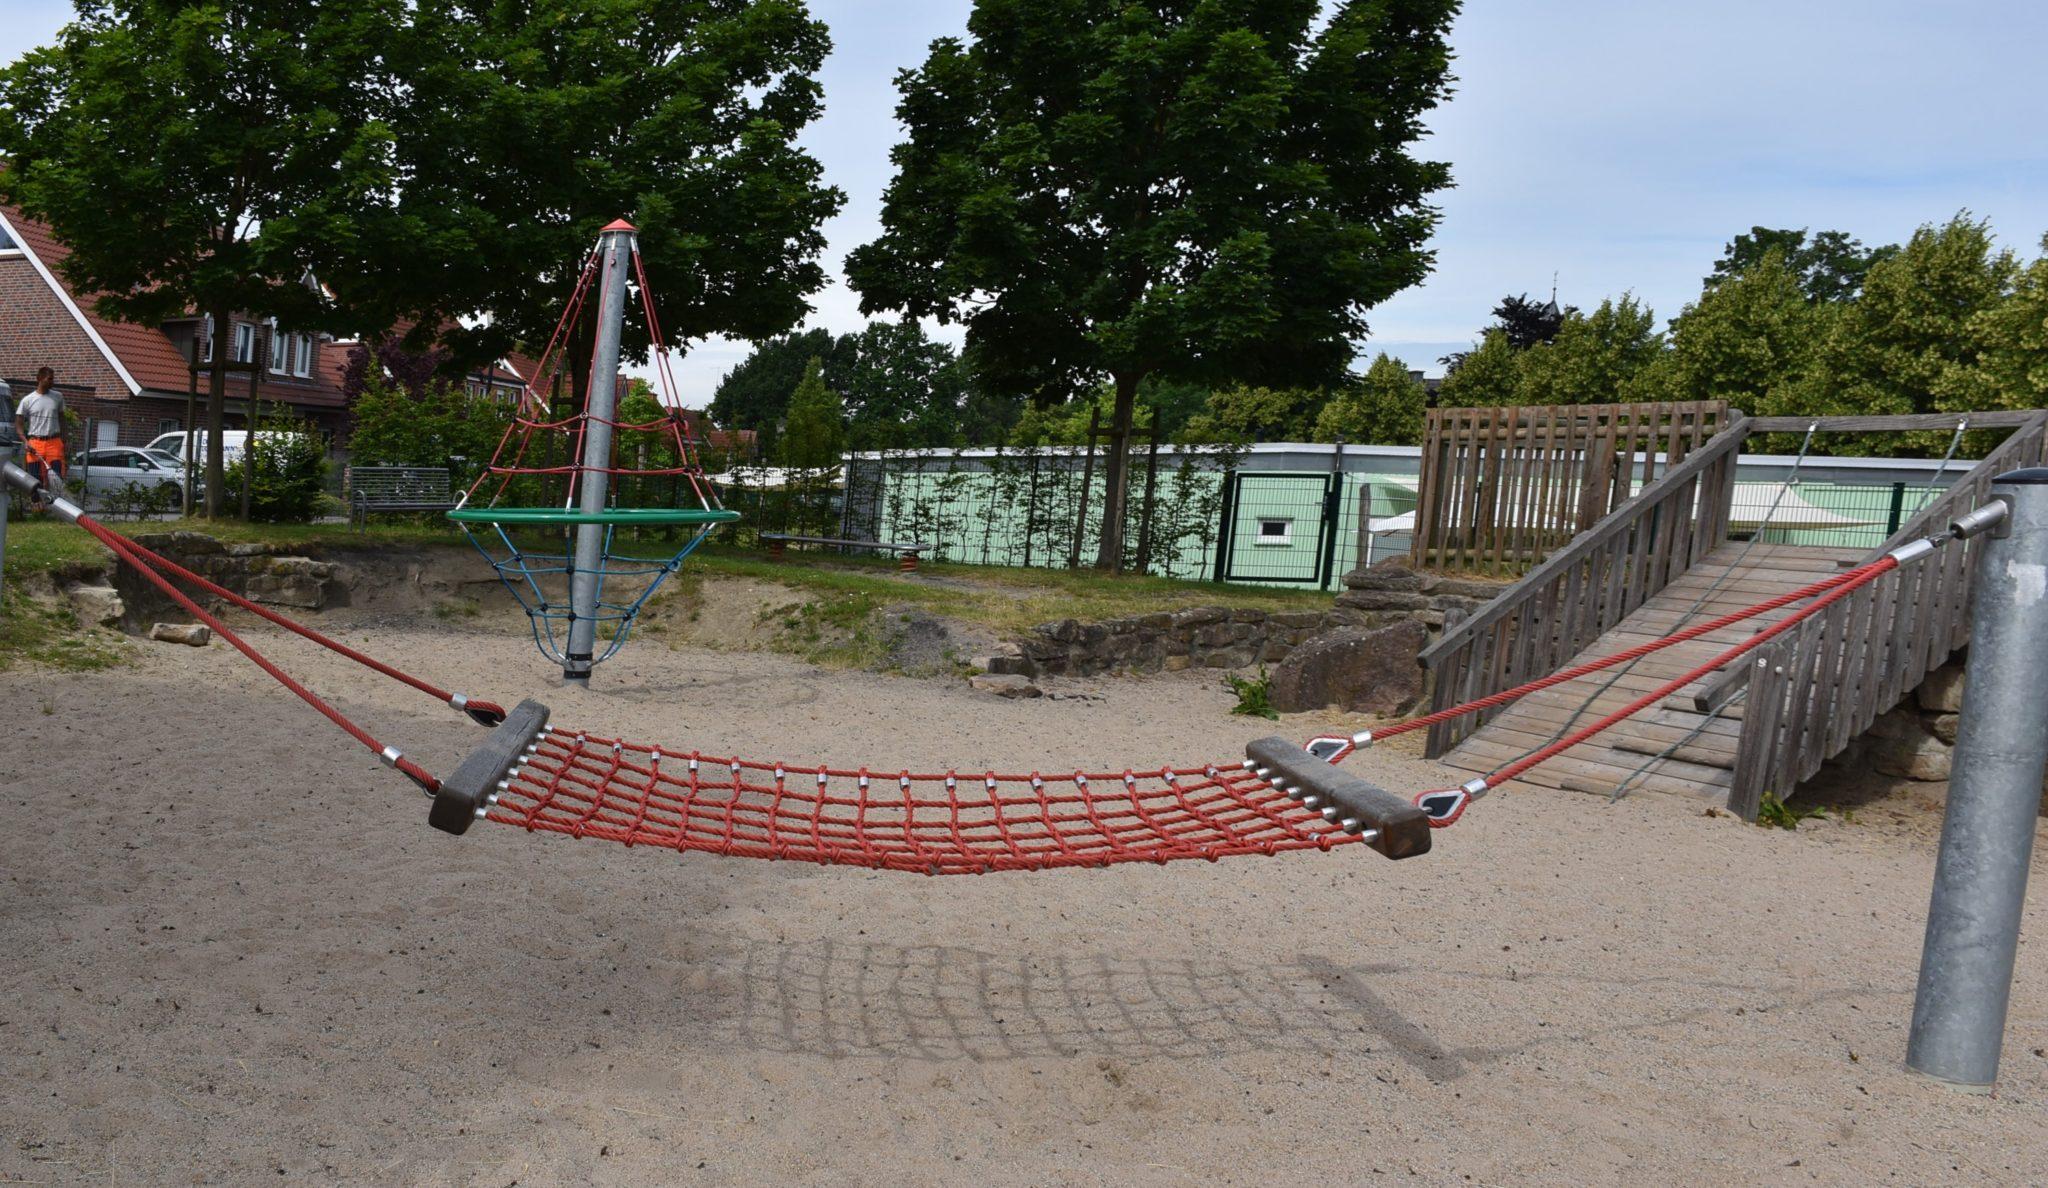 Übersicht Netzschaukel Spielplatz Hombrede II